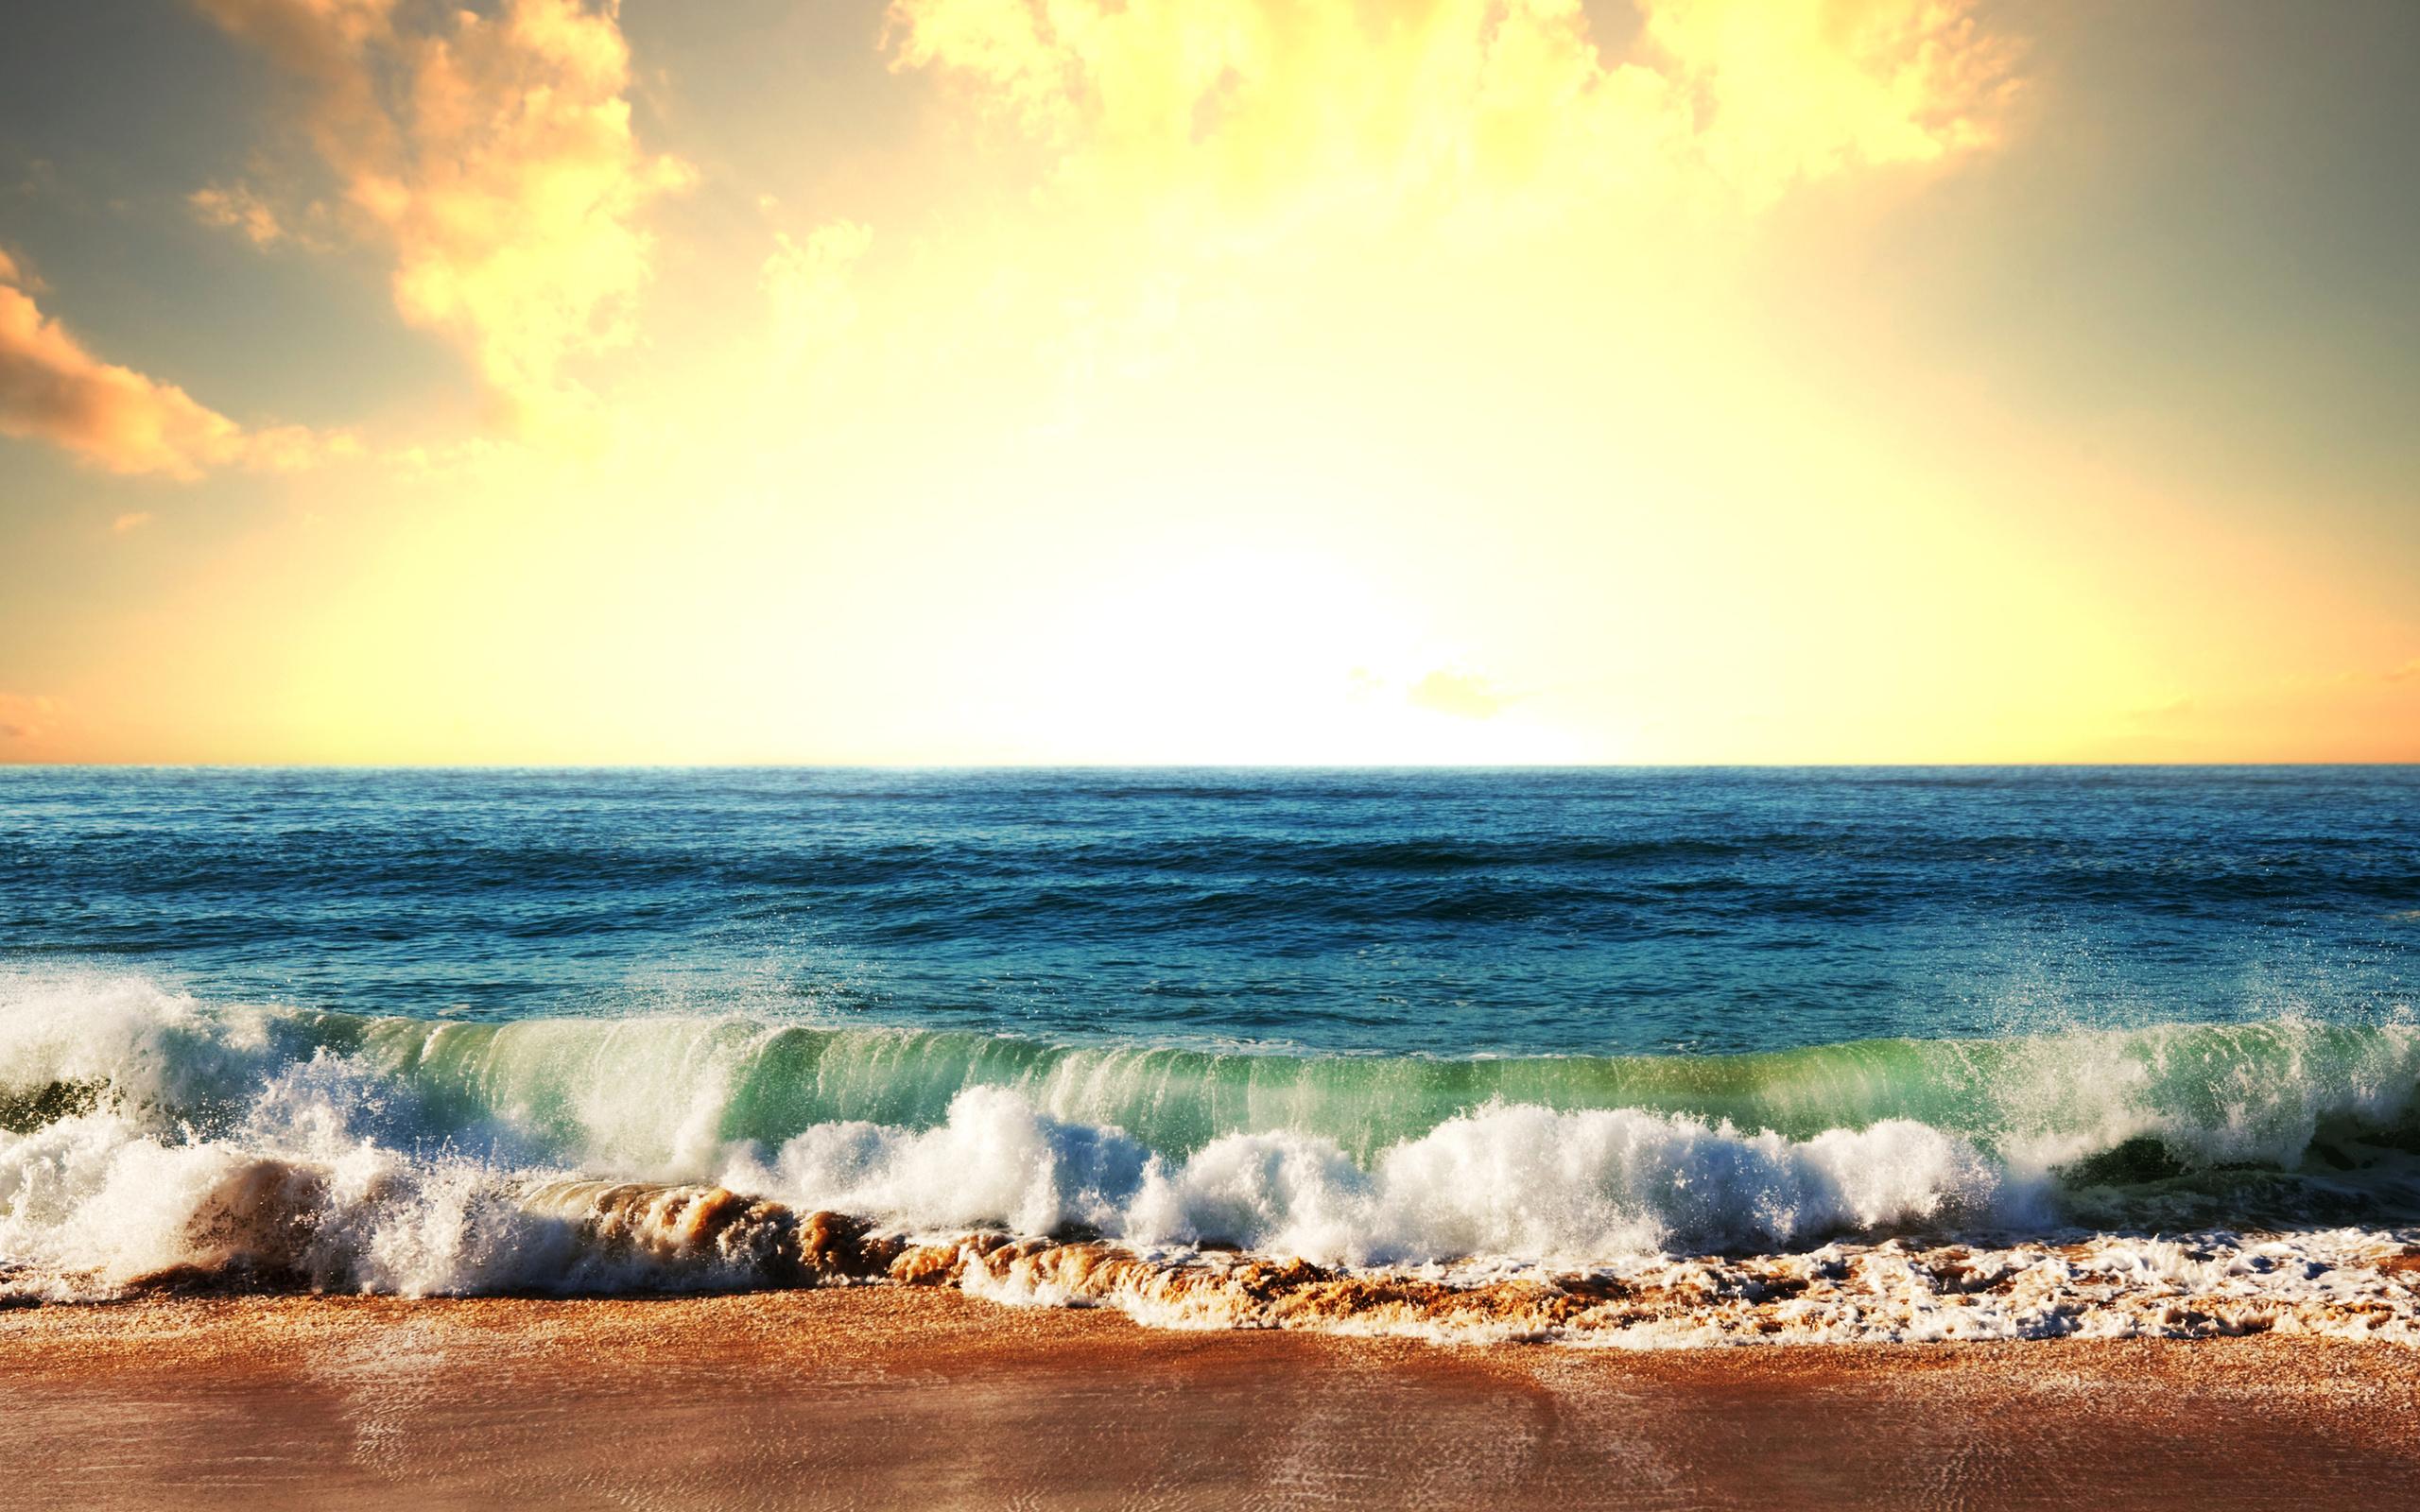 Картинка, картинки лето море солнце пляж крым